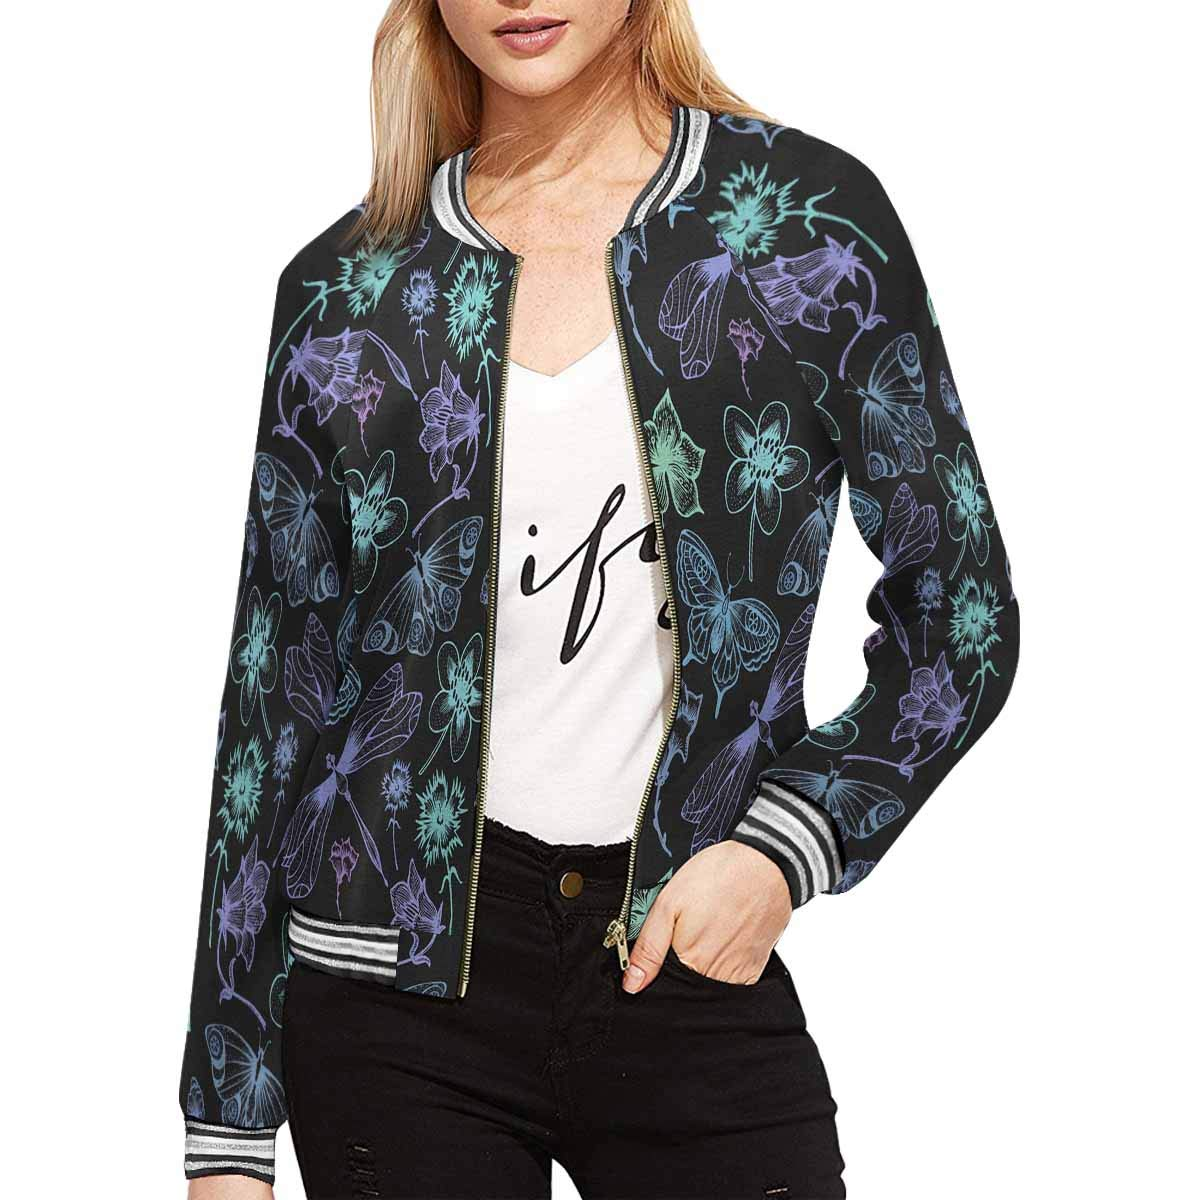 INTERESTPRINT Women's Lightweight Jacket Coat Outwear